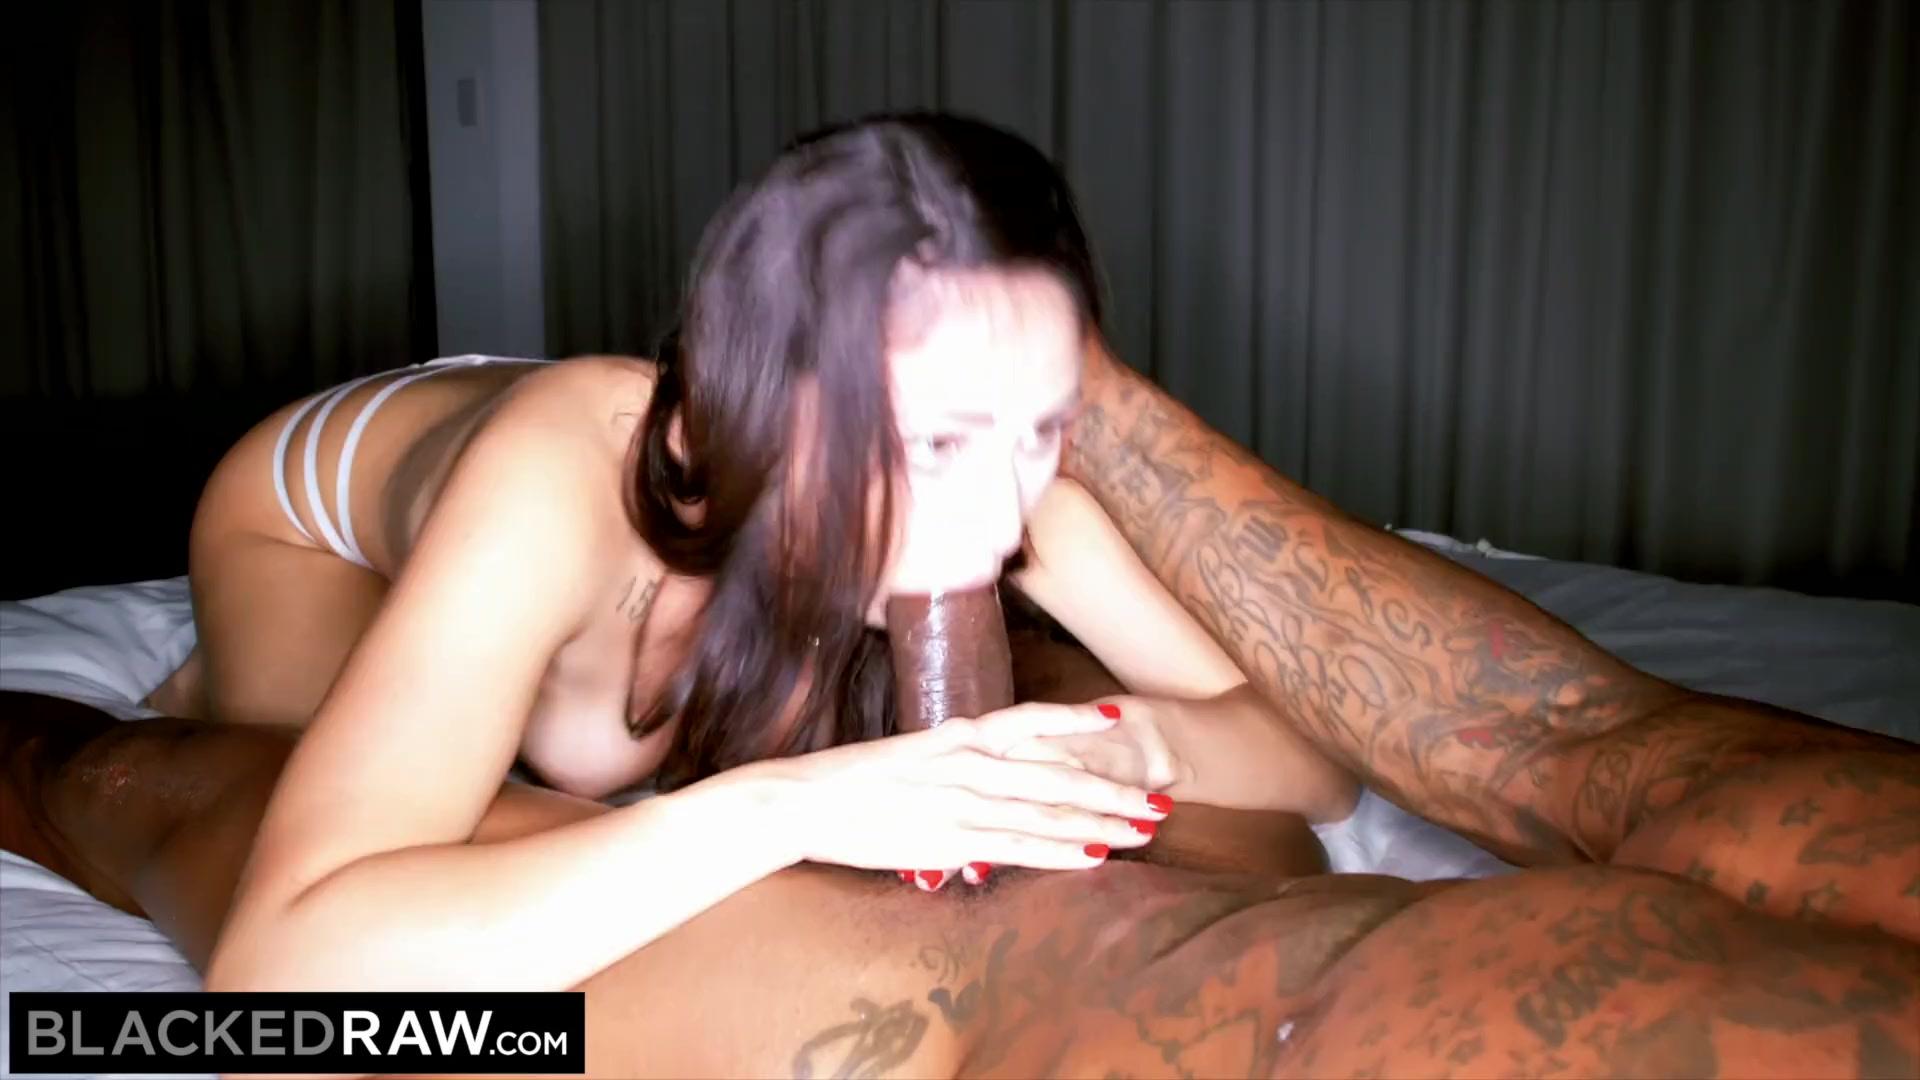 Preview 8 of Ebonyedraw Kinky Brunette Wife Loves Ebony Cock In Her Hotel Room